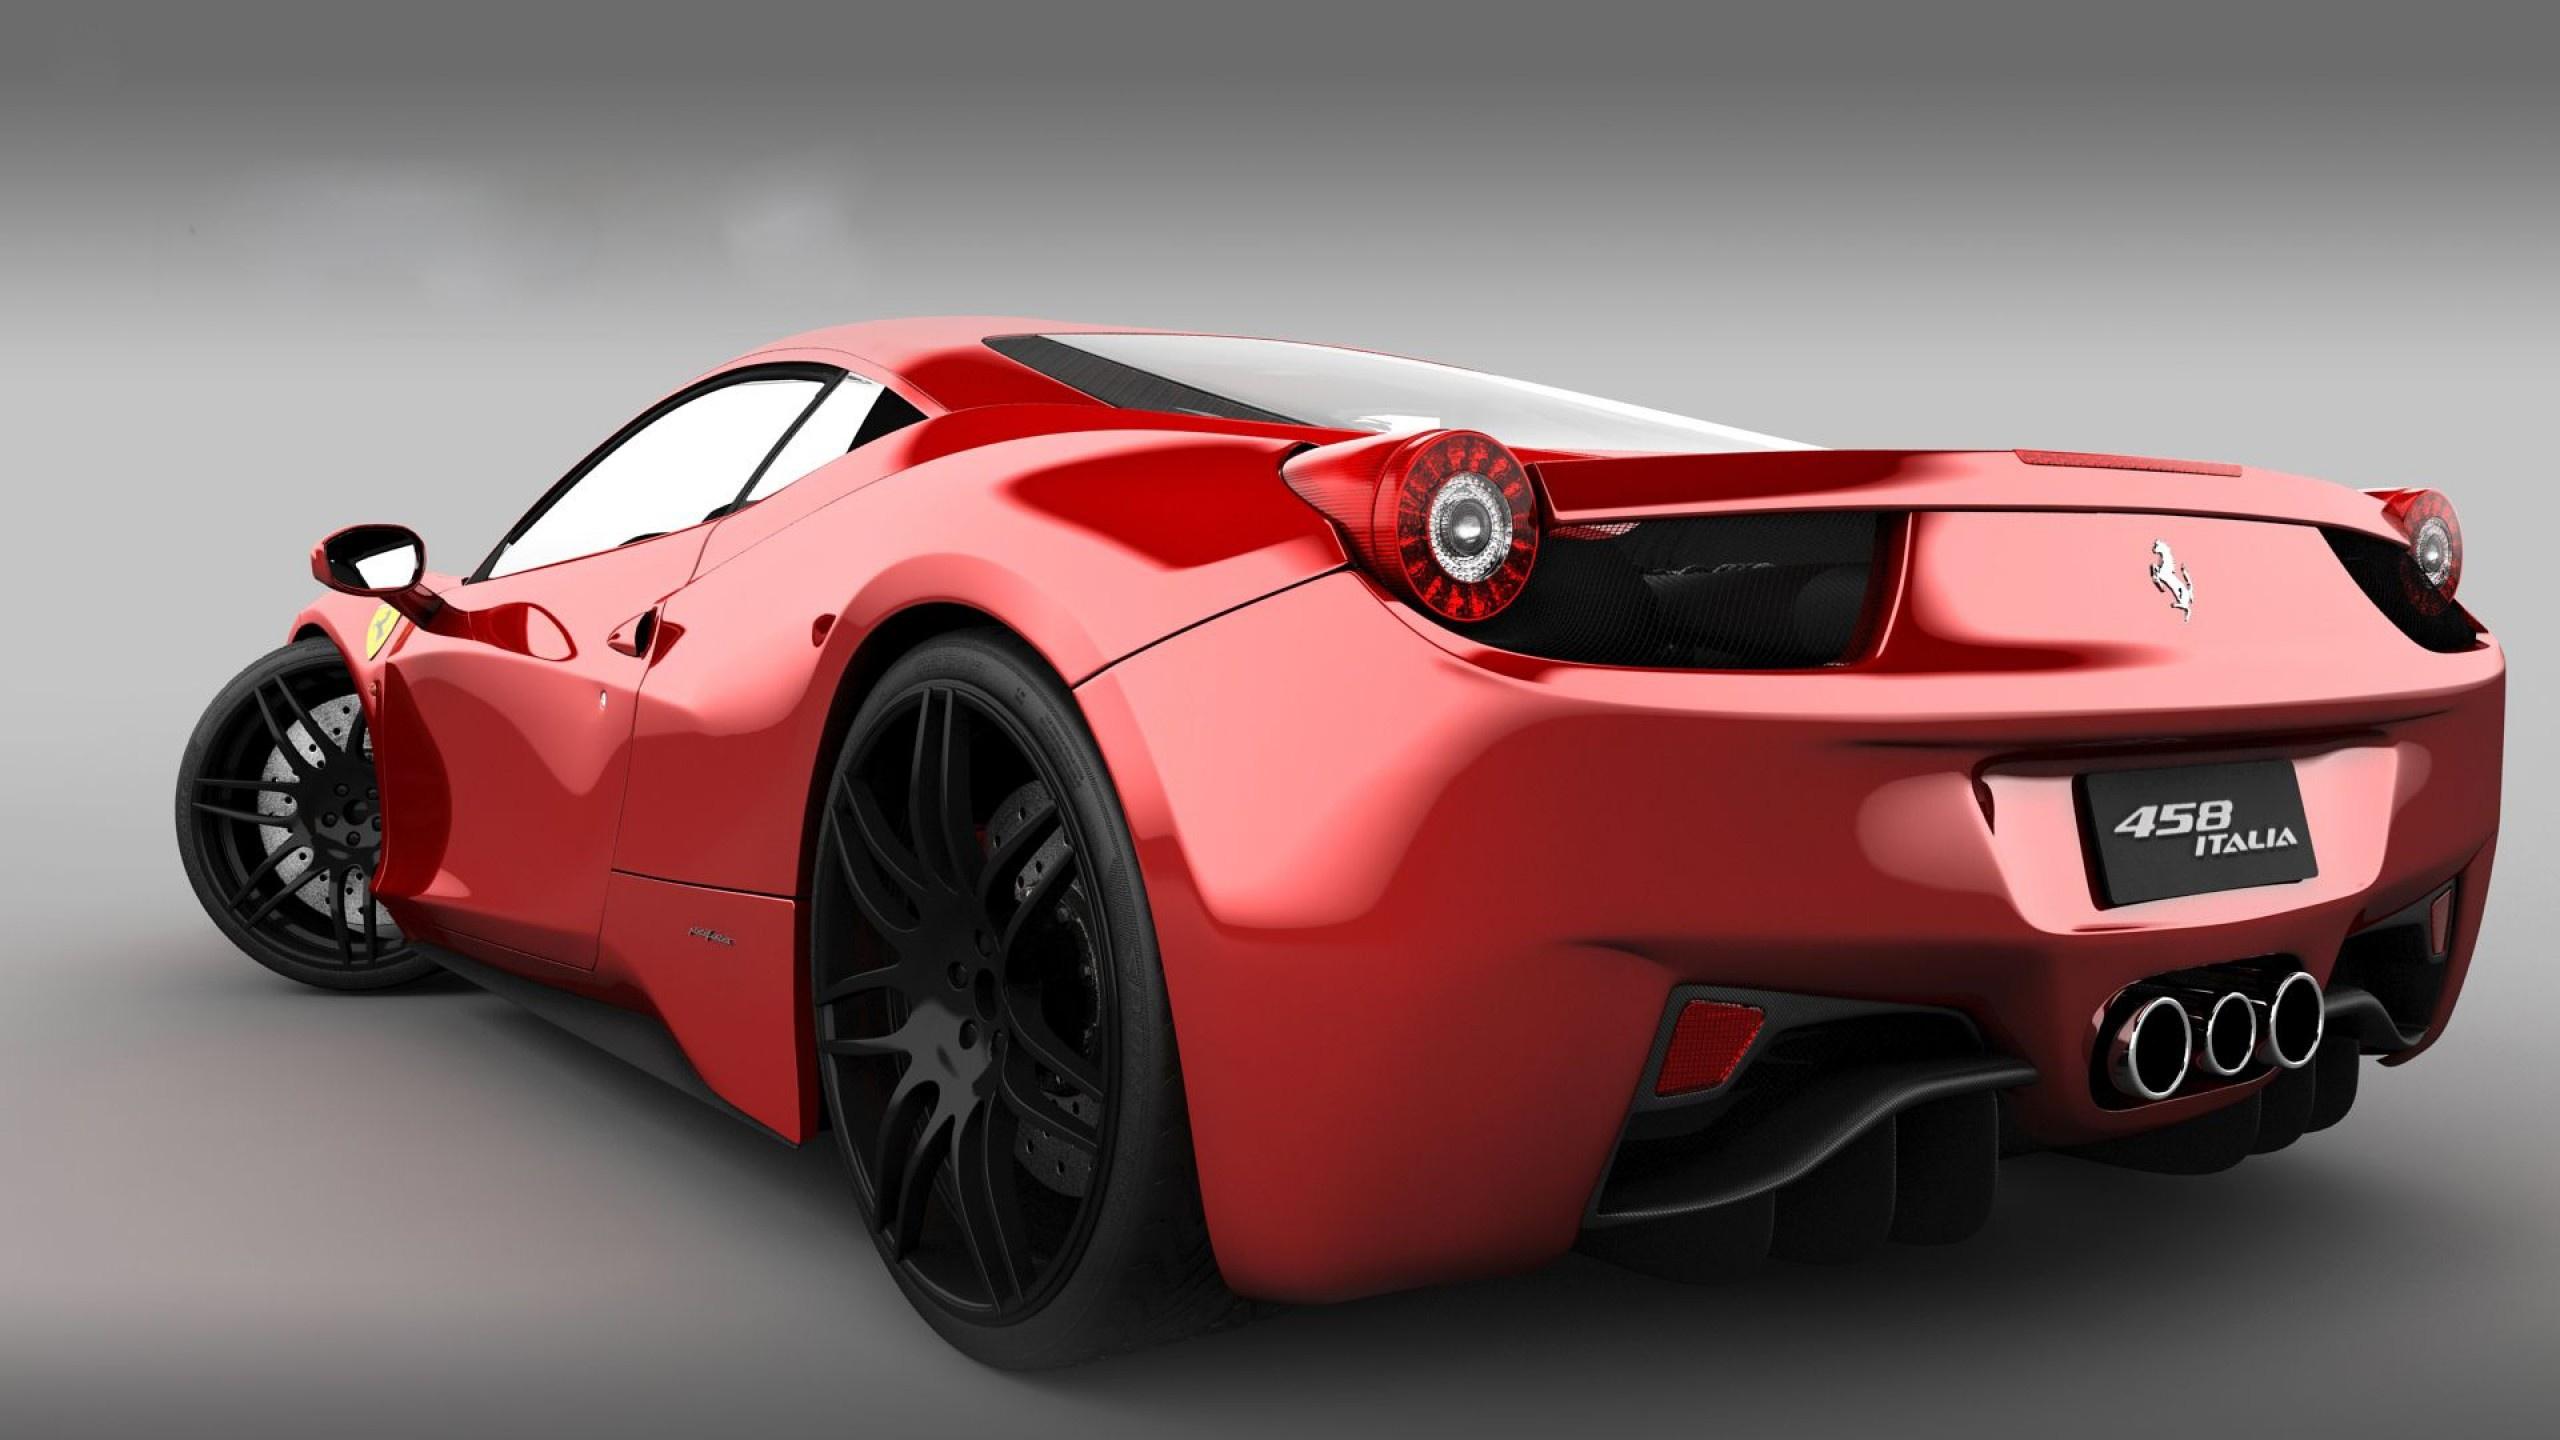 Free Download Ferrari 458 Italia Rear Side Hd Wallpapers 2560x1440 For Your Desktop Mobile Tablet Explore 48 Ferrari 458 Italia Wallpaper Hd Italia Wallpaper